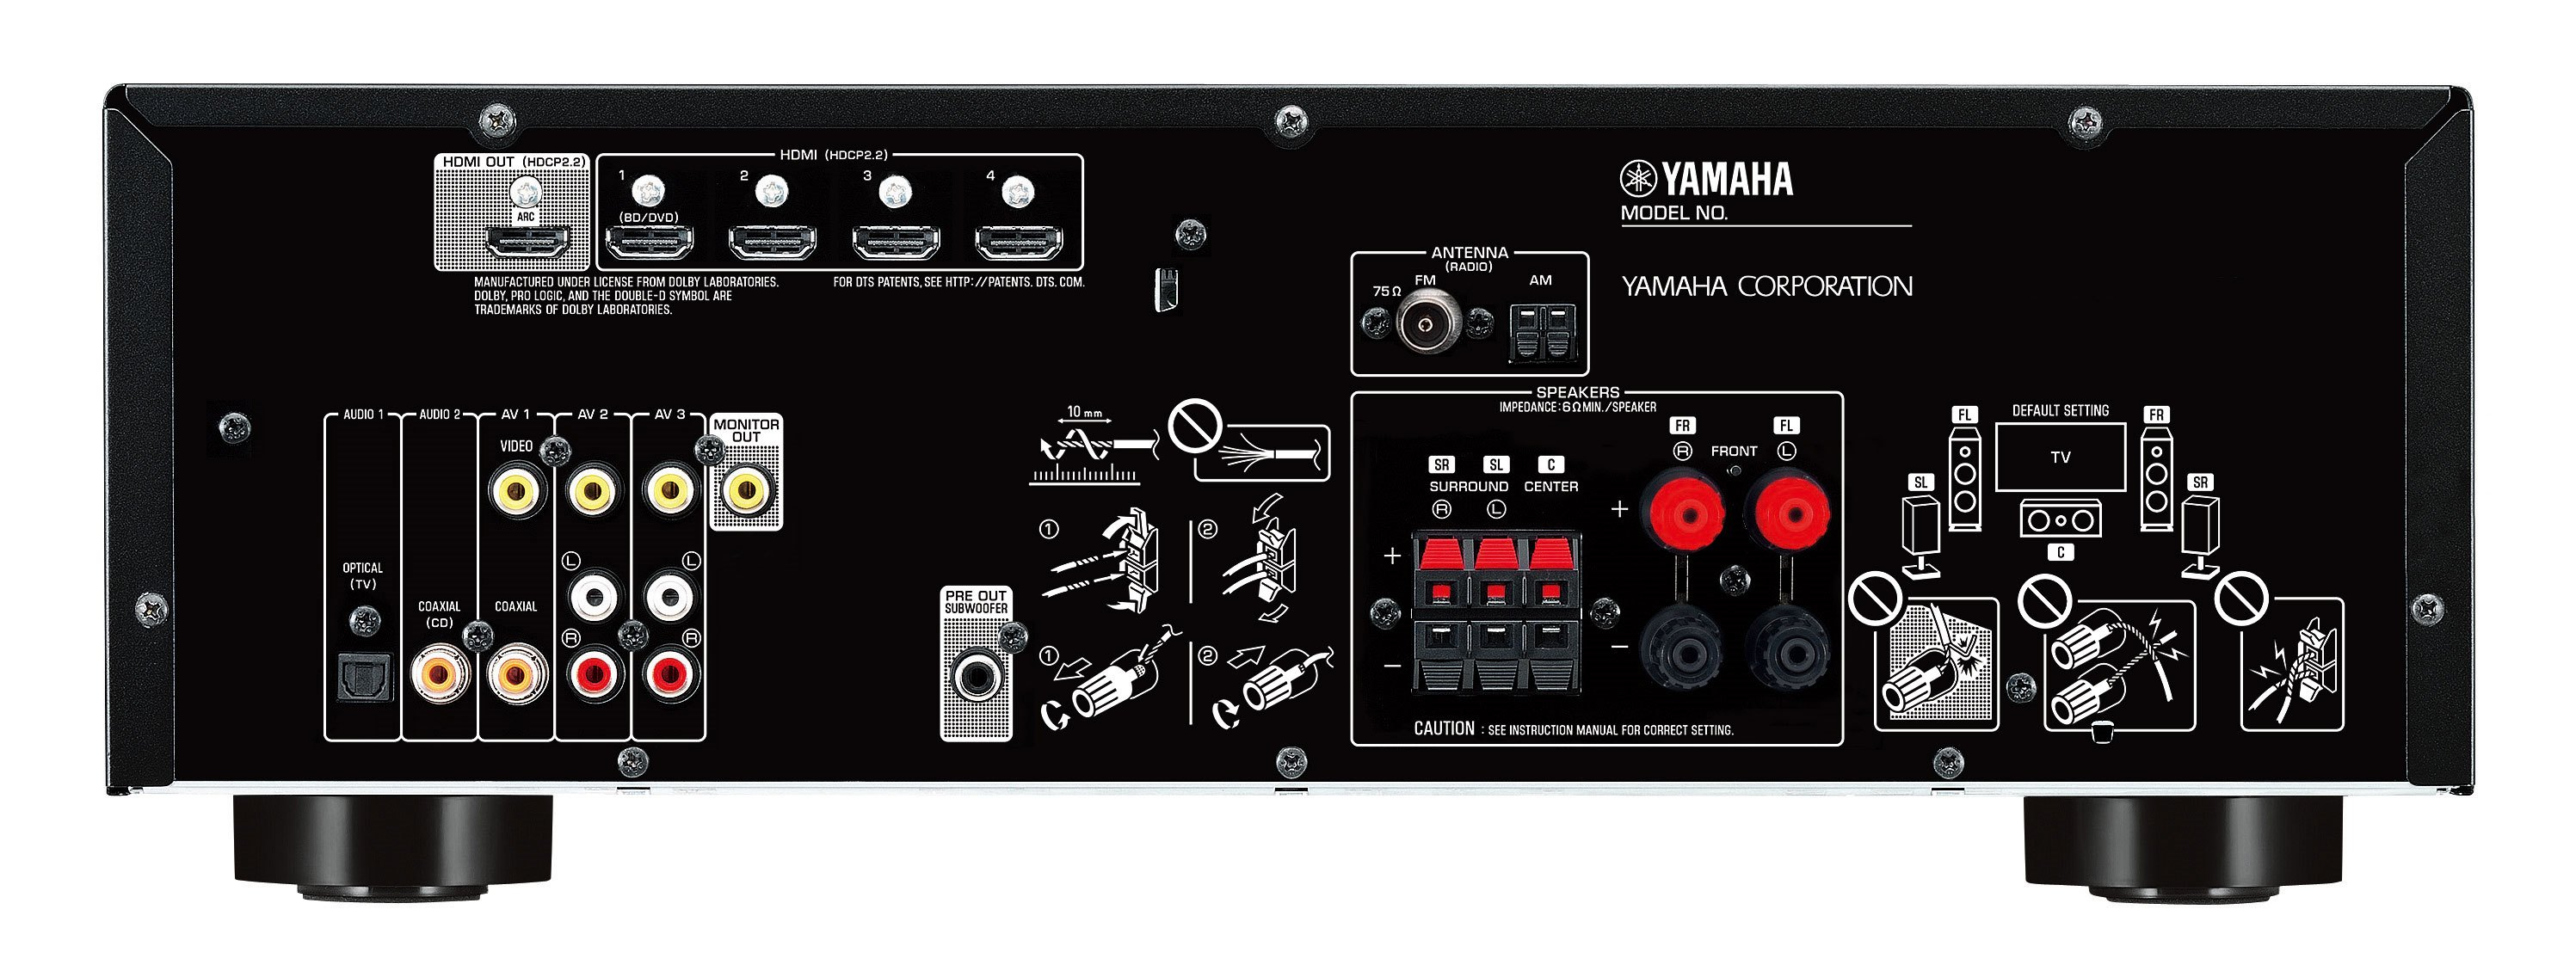 CSMusiksysteme GmbH | Yamaha HTR-3071 - schwarz | Hifi